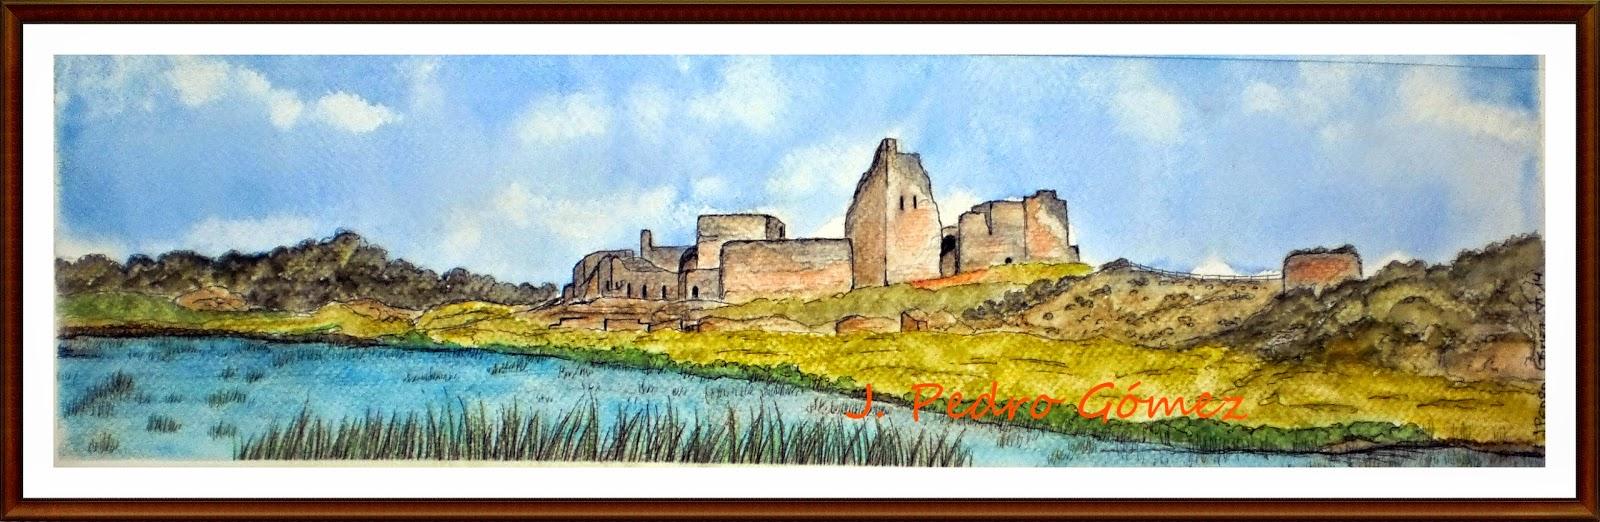 calatrava la vieja, castillo, ciudad real, plumilla, tinta, acuarela, tecnica mixta, j. pedro gómez, paisaje